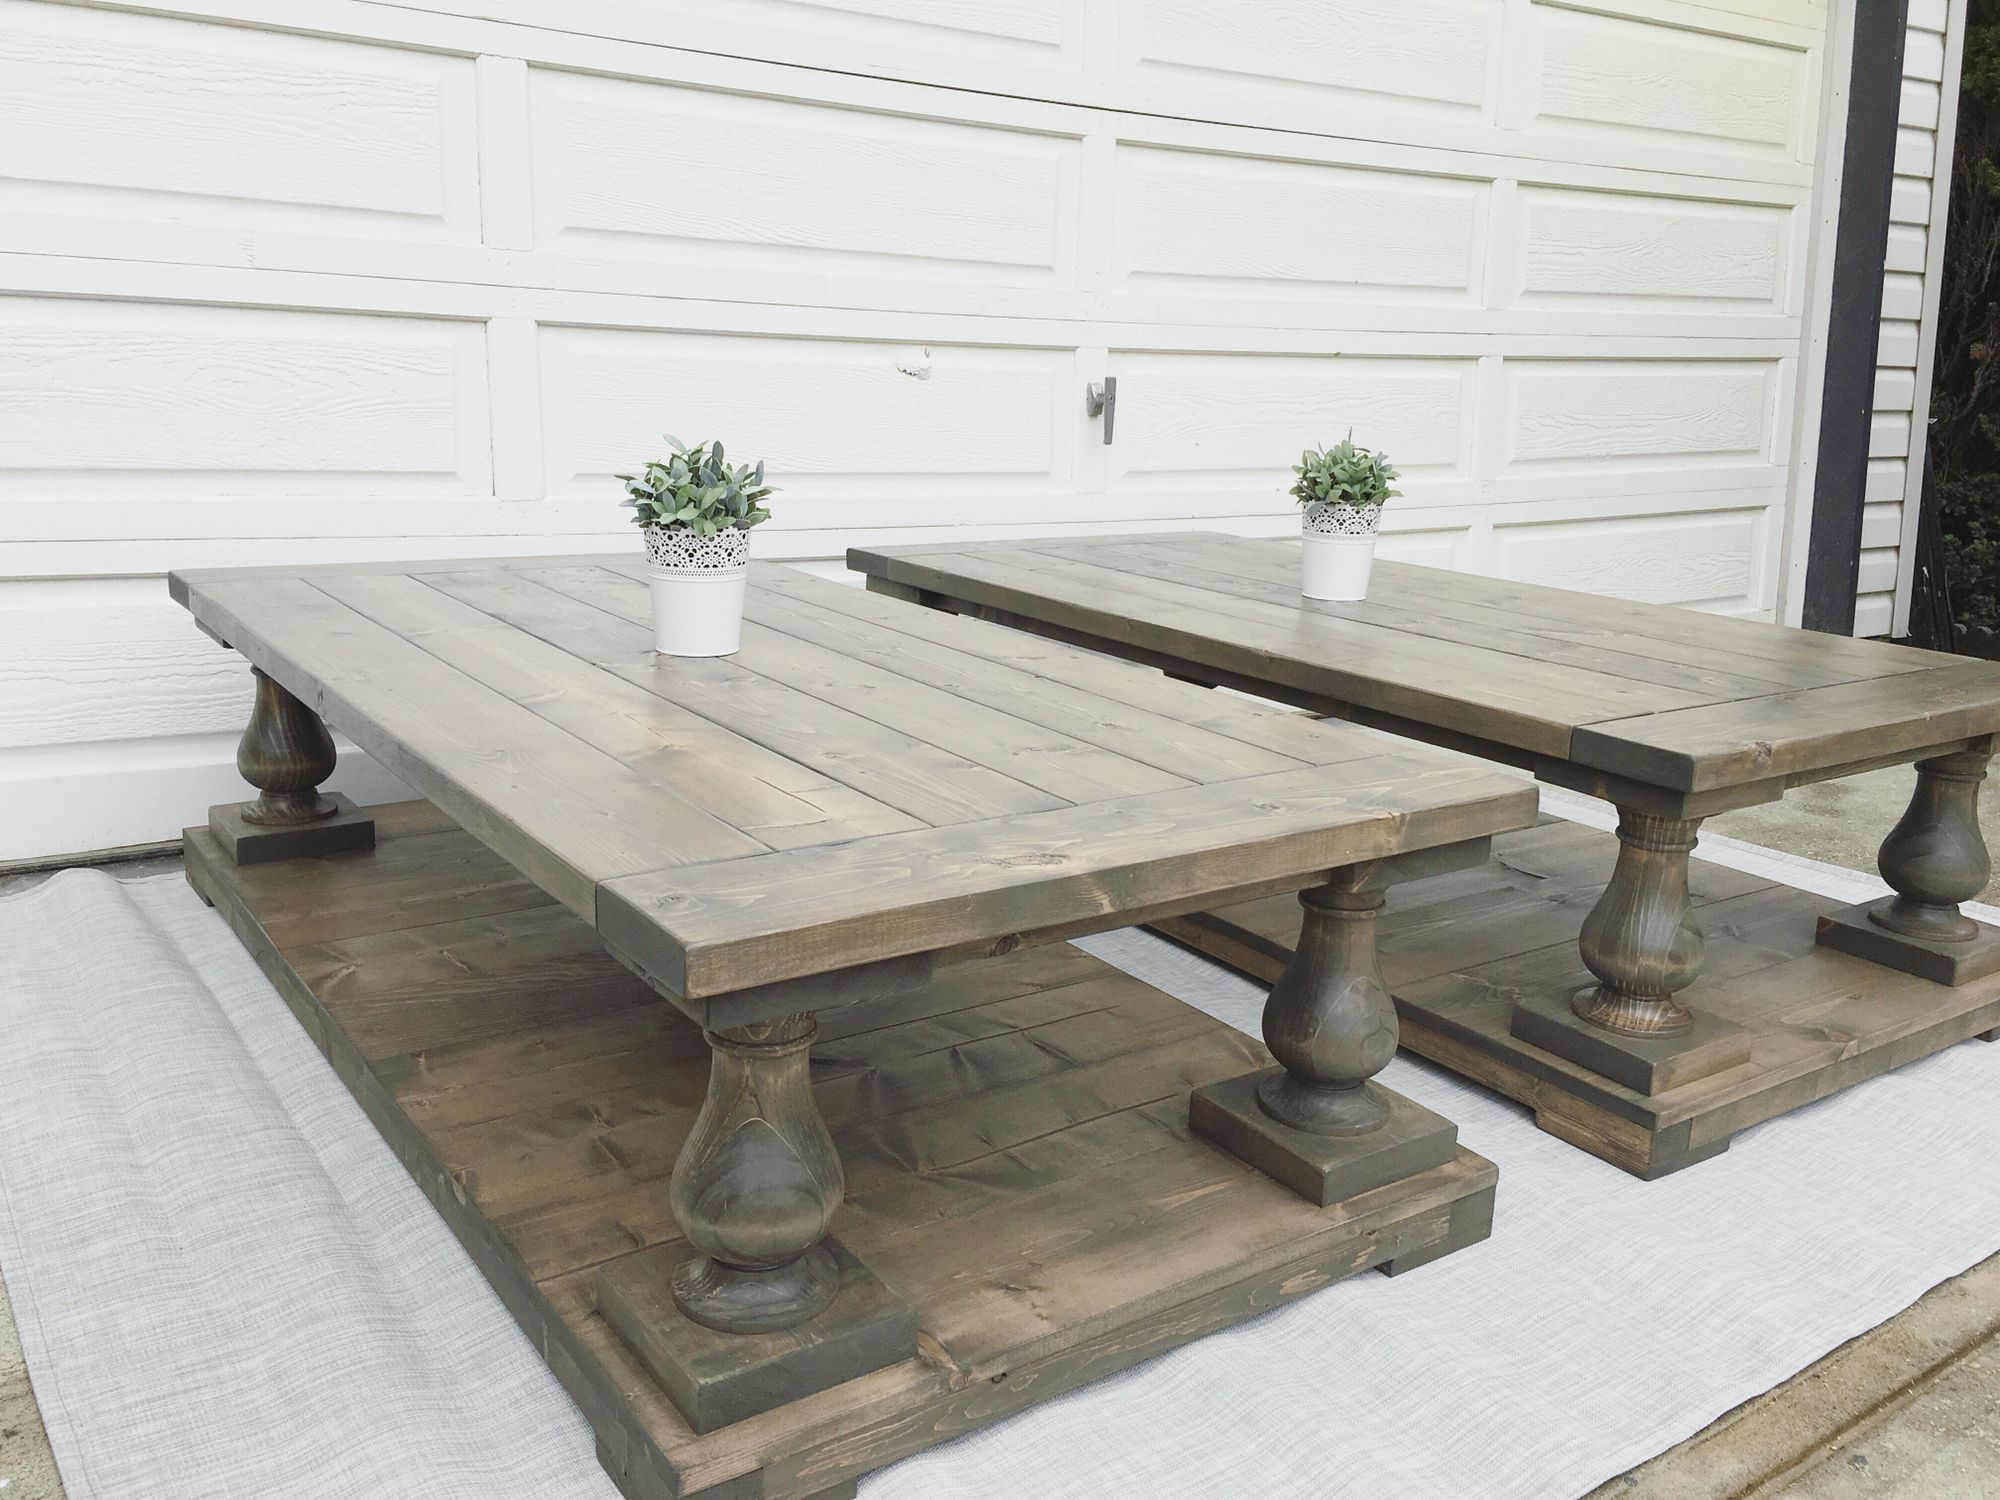 1031431fb544d2ccac3396fc3f8eaf78 Balustrade Salvaged Wood Coffee Table